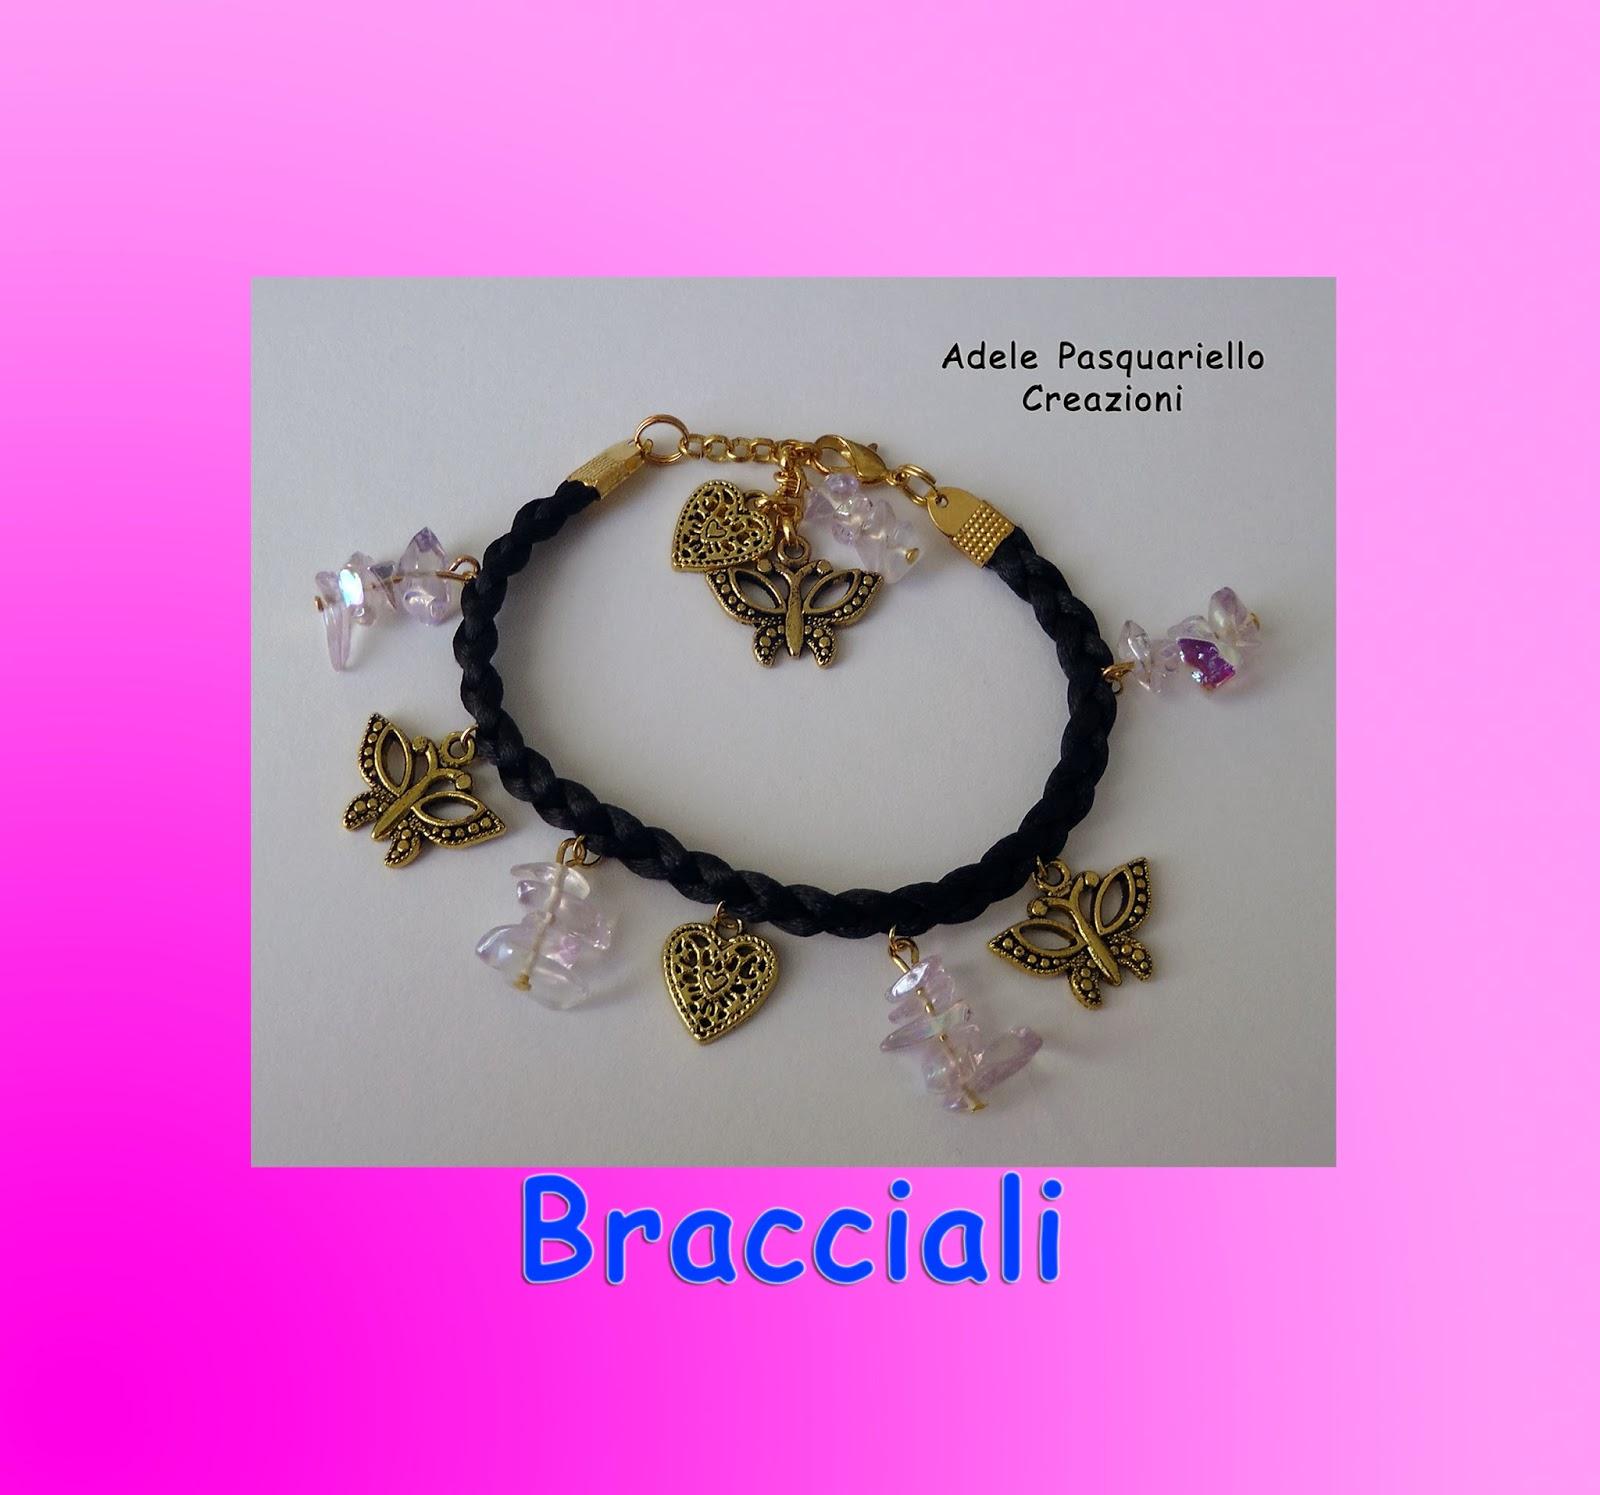 http://adelepasquariello.blogspot.it/2013/10/bracciali.html